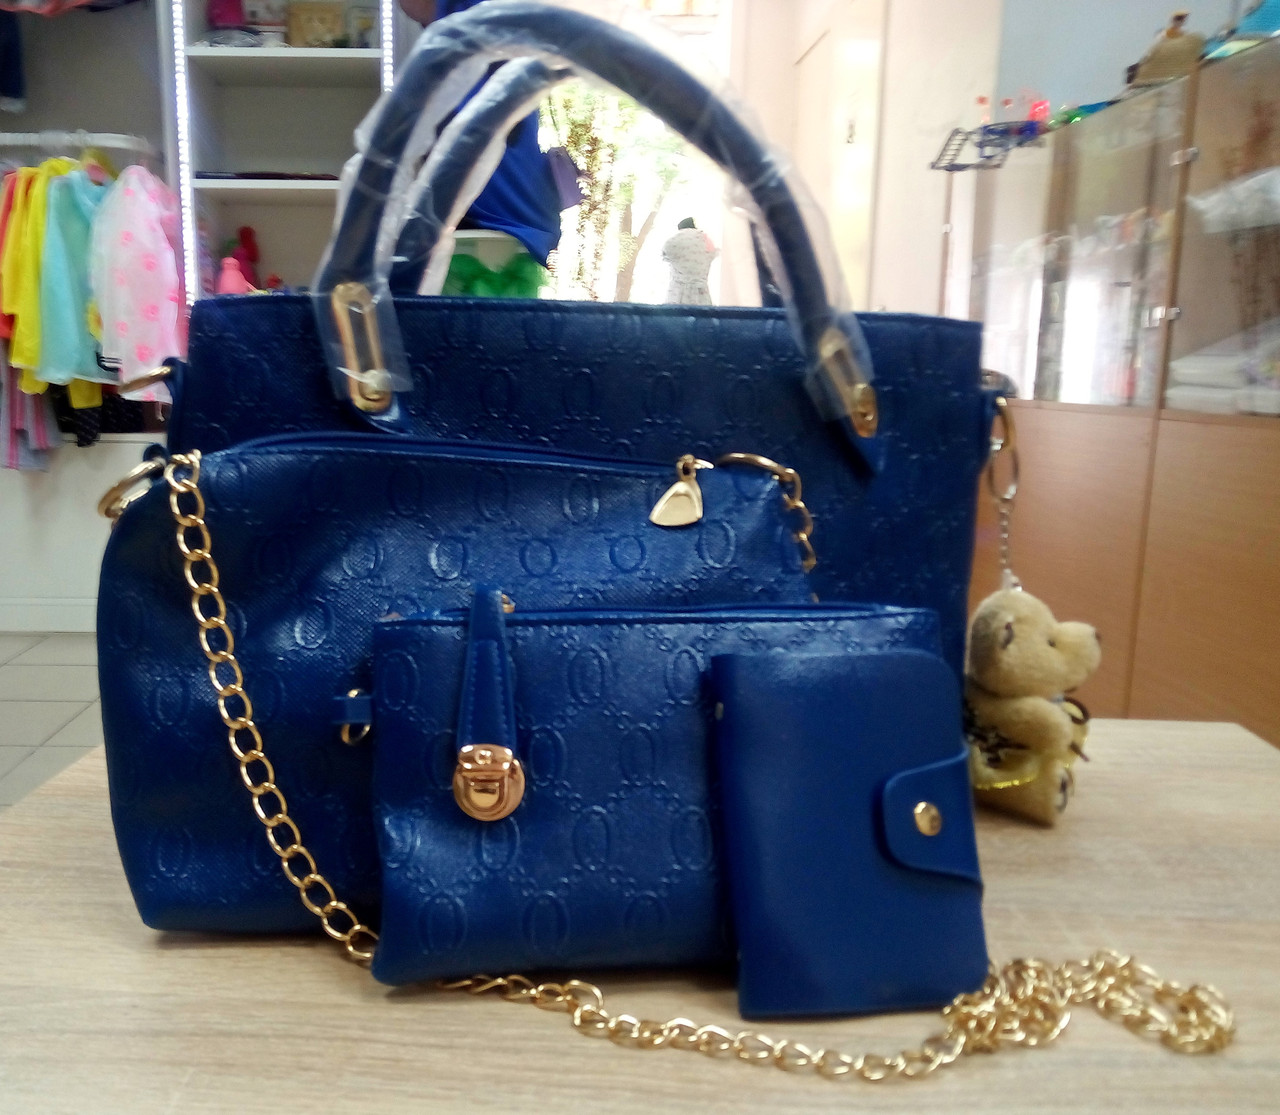 fa7105b0e208 Сумки, Женская модель 2016 года в сумки есть сумка на цепочки +косметичка +  картхолдэр